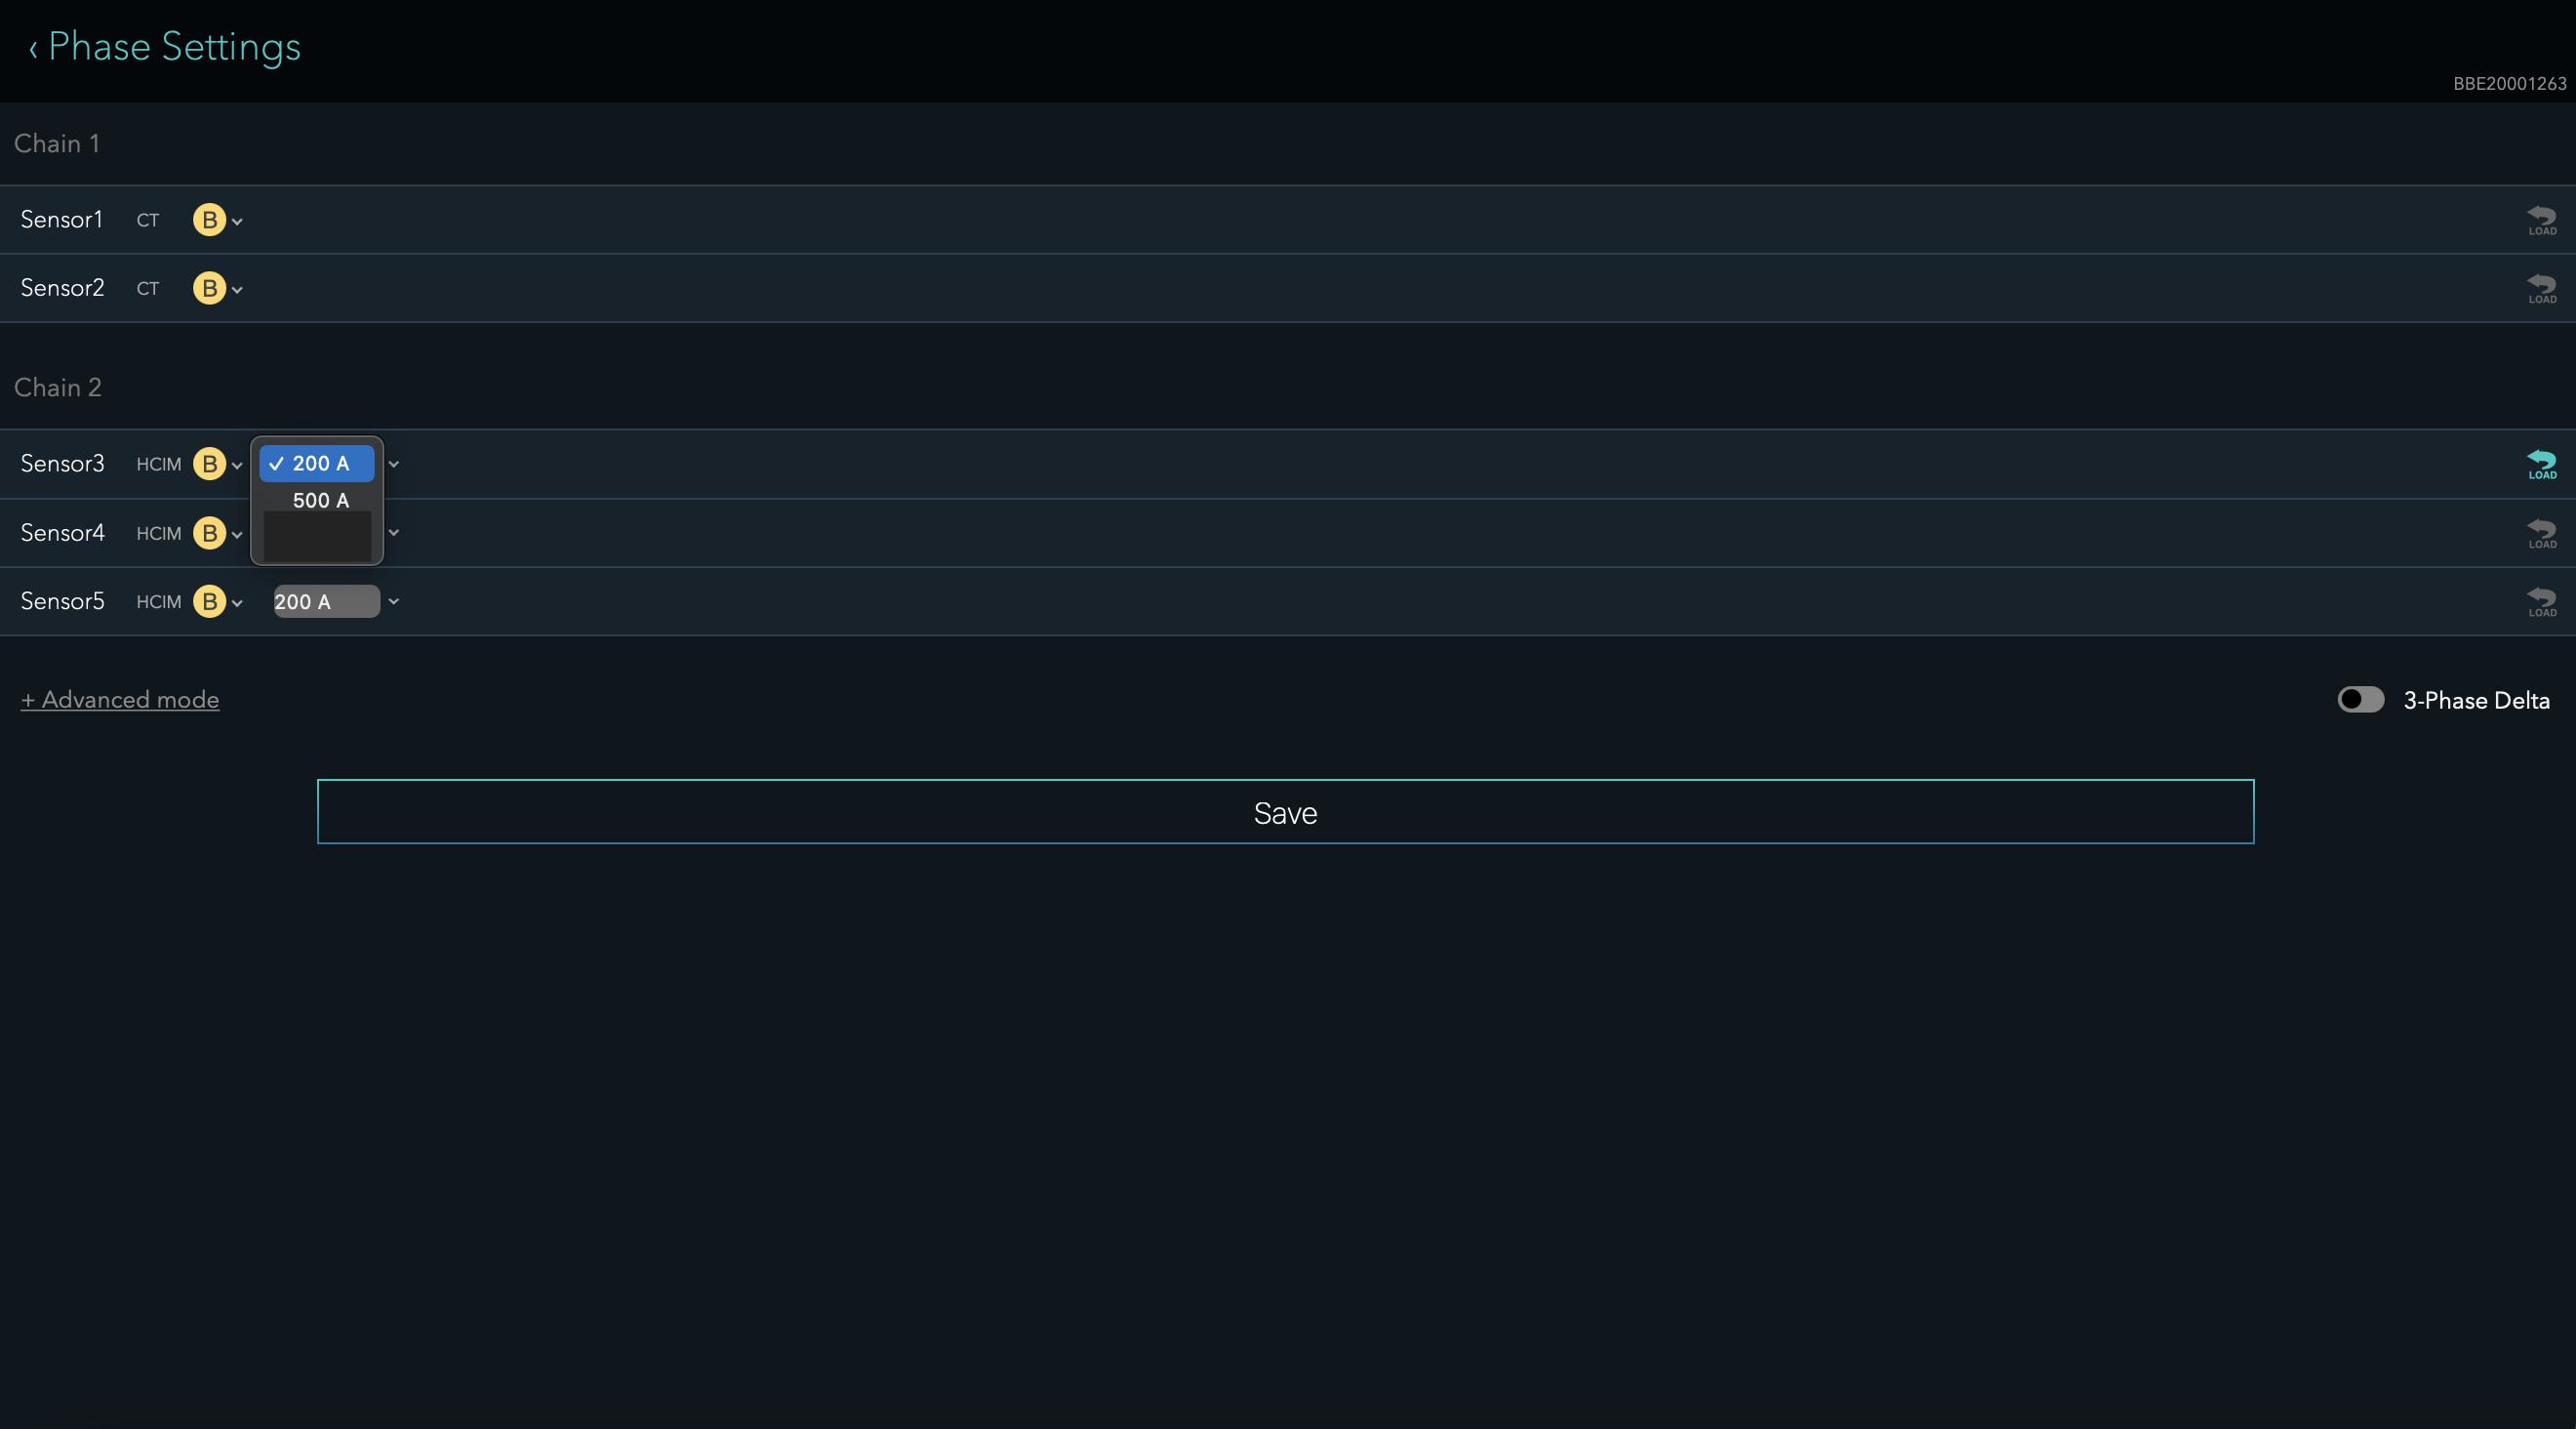 Phase settings screen